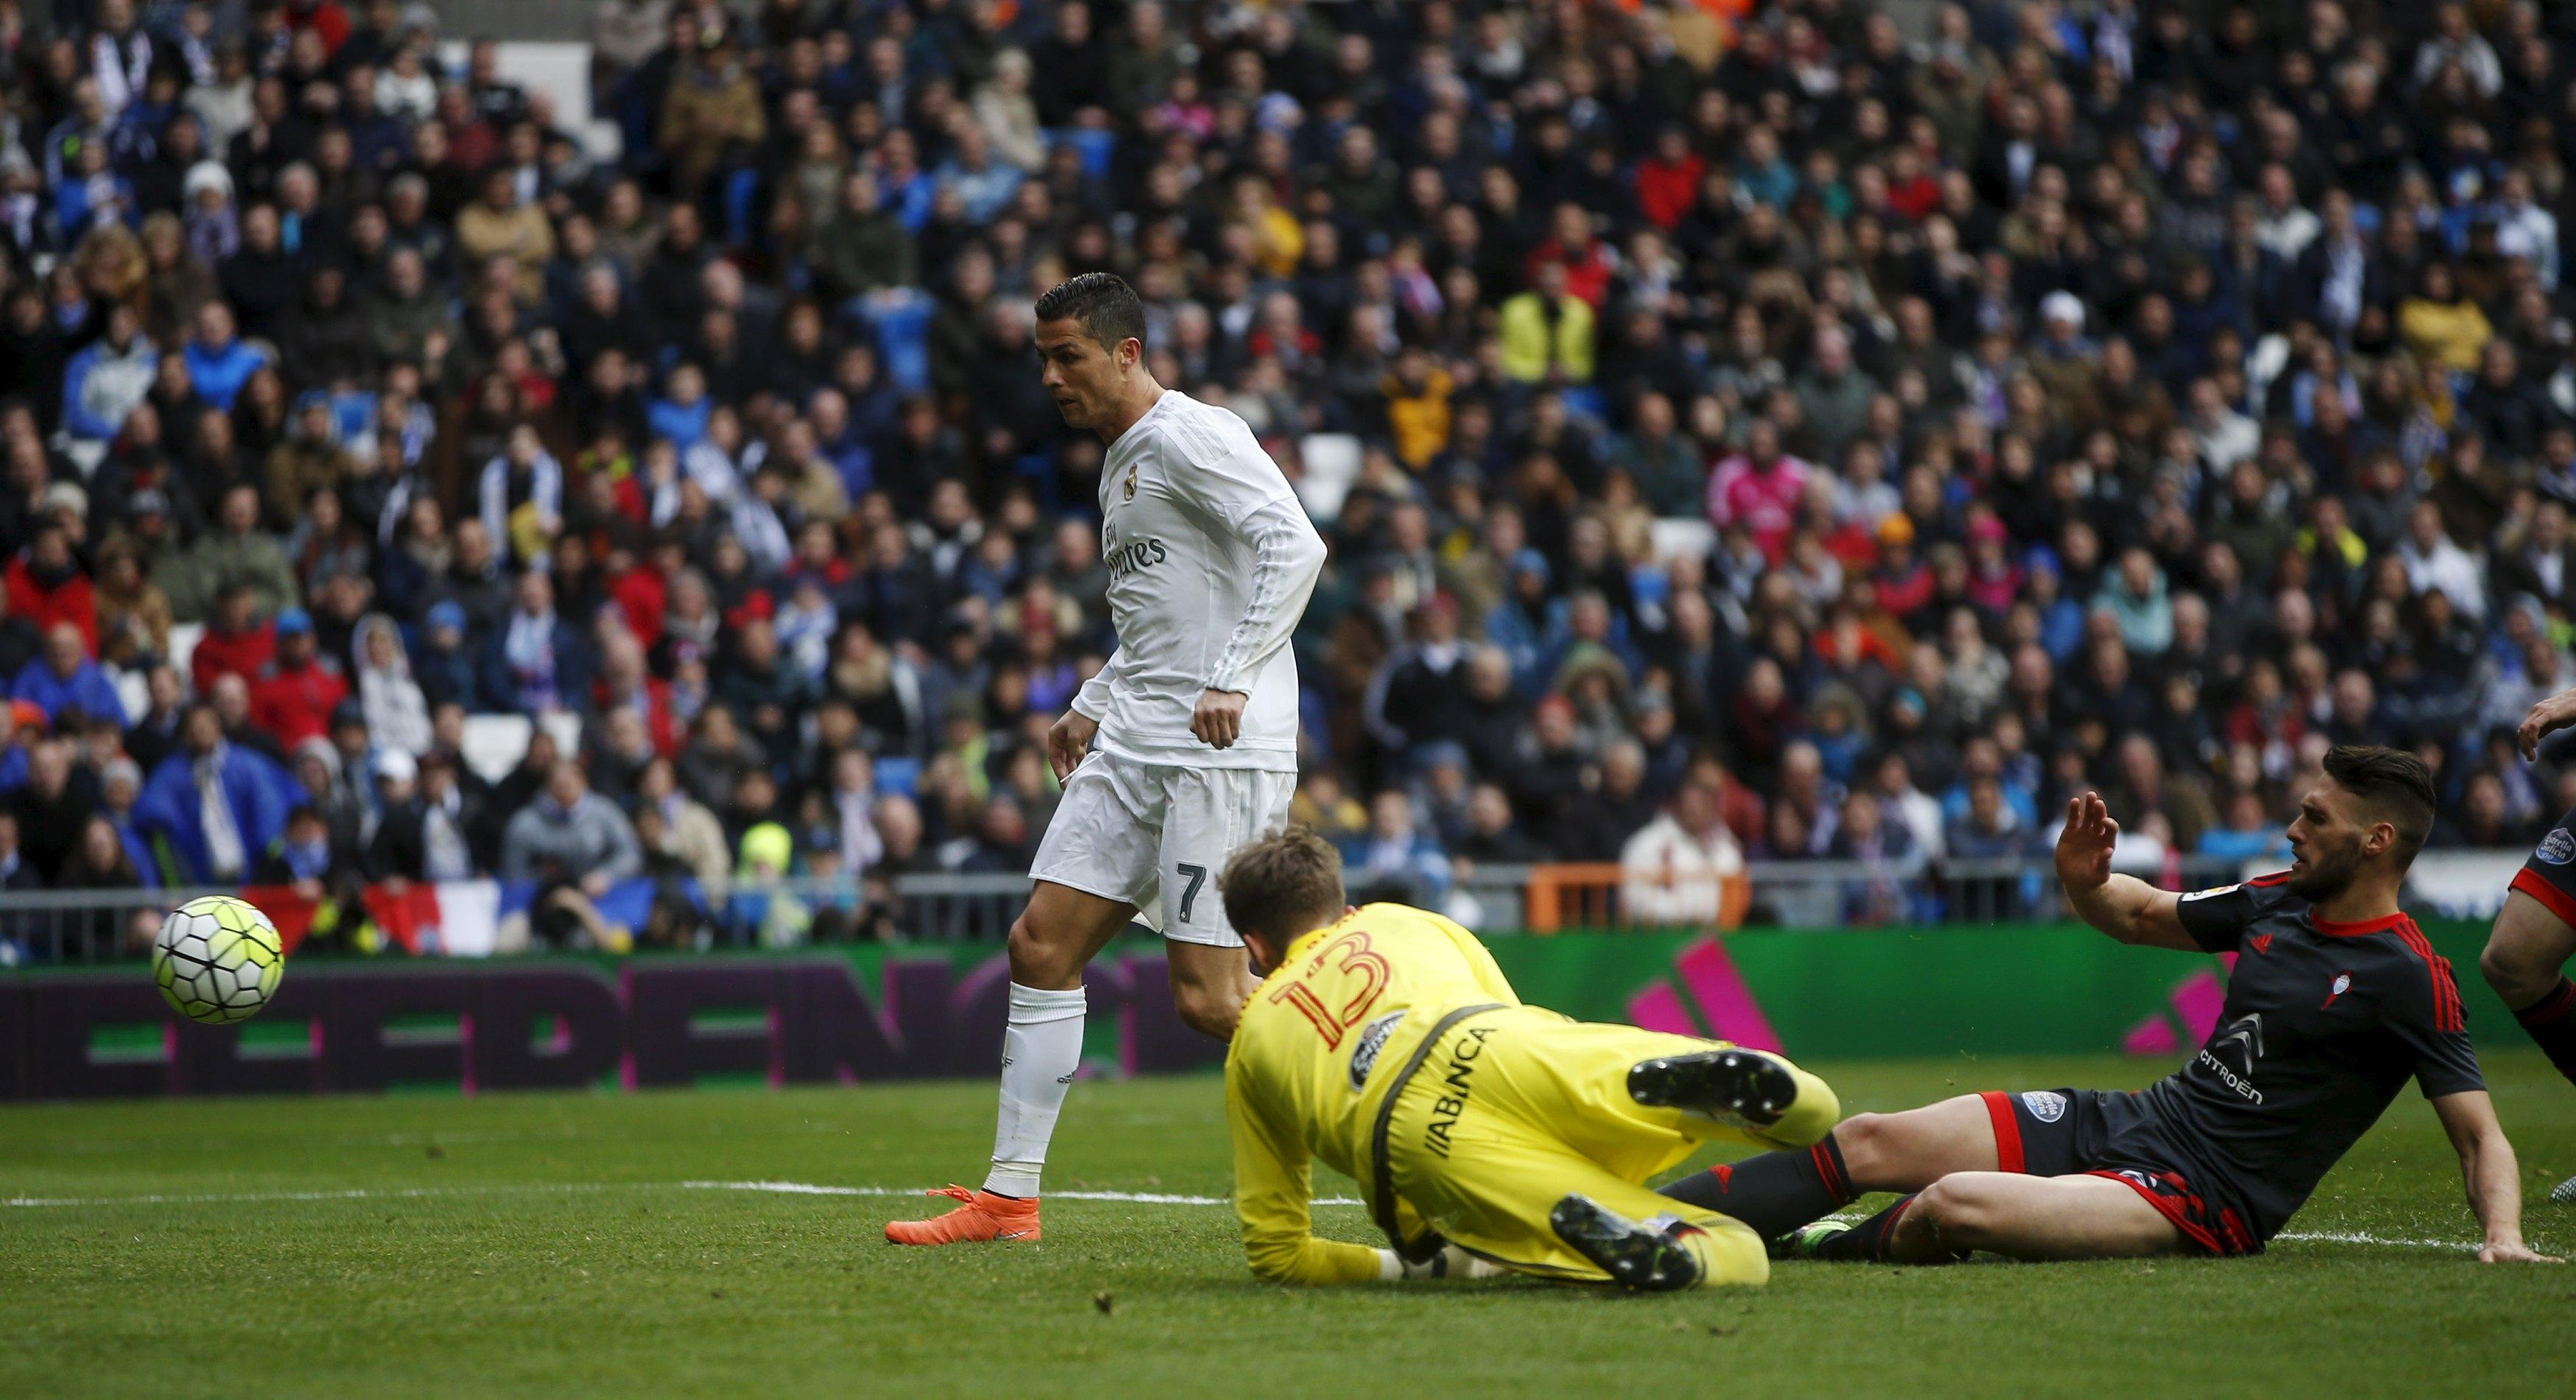 Cristiano sigue batiendo récords goleadores en la Liga BBVA. /REUTERS